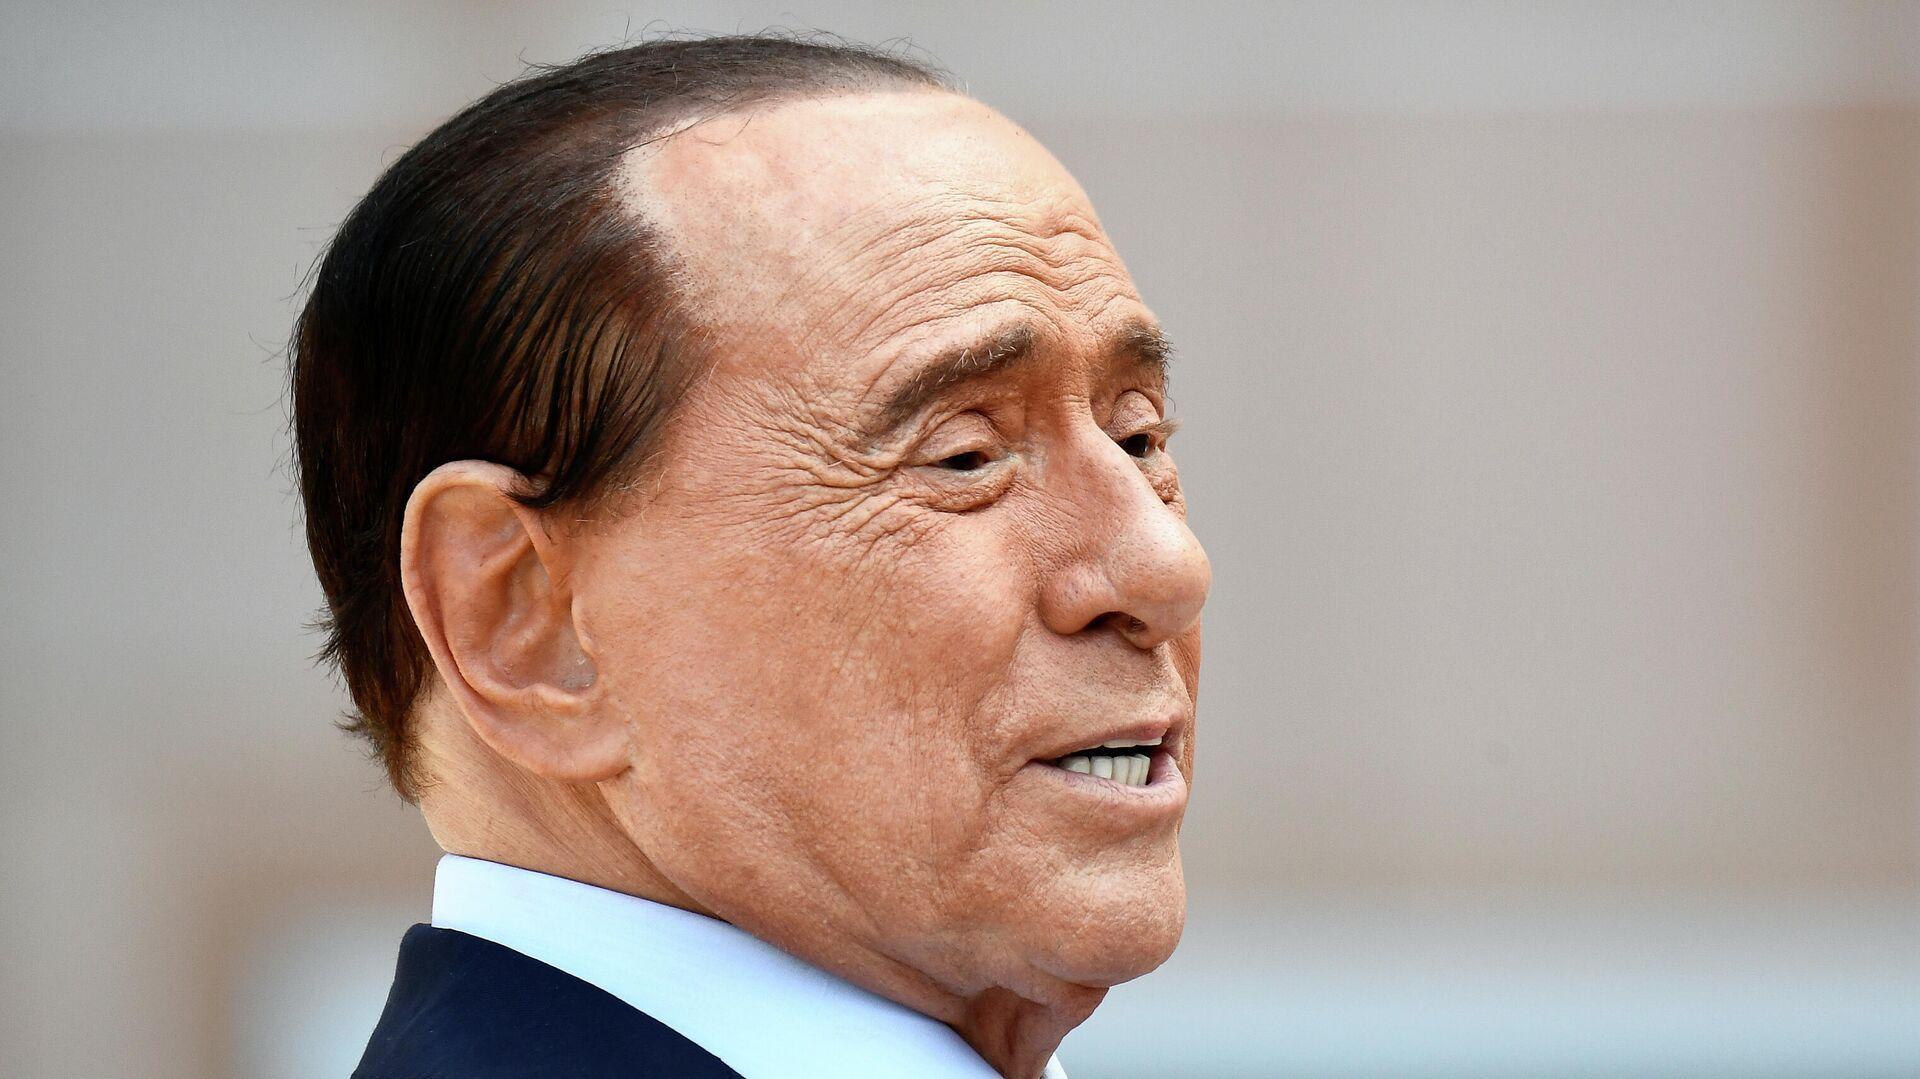 Silvio Berlusconi, el ex primer ministro de Italia - Sputnik Mundo, 1920, 24.03.2021